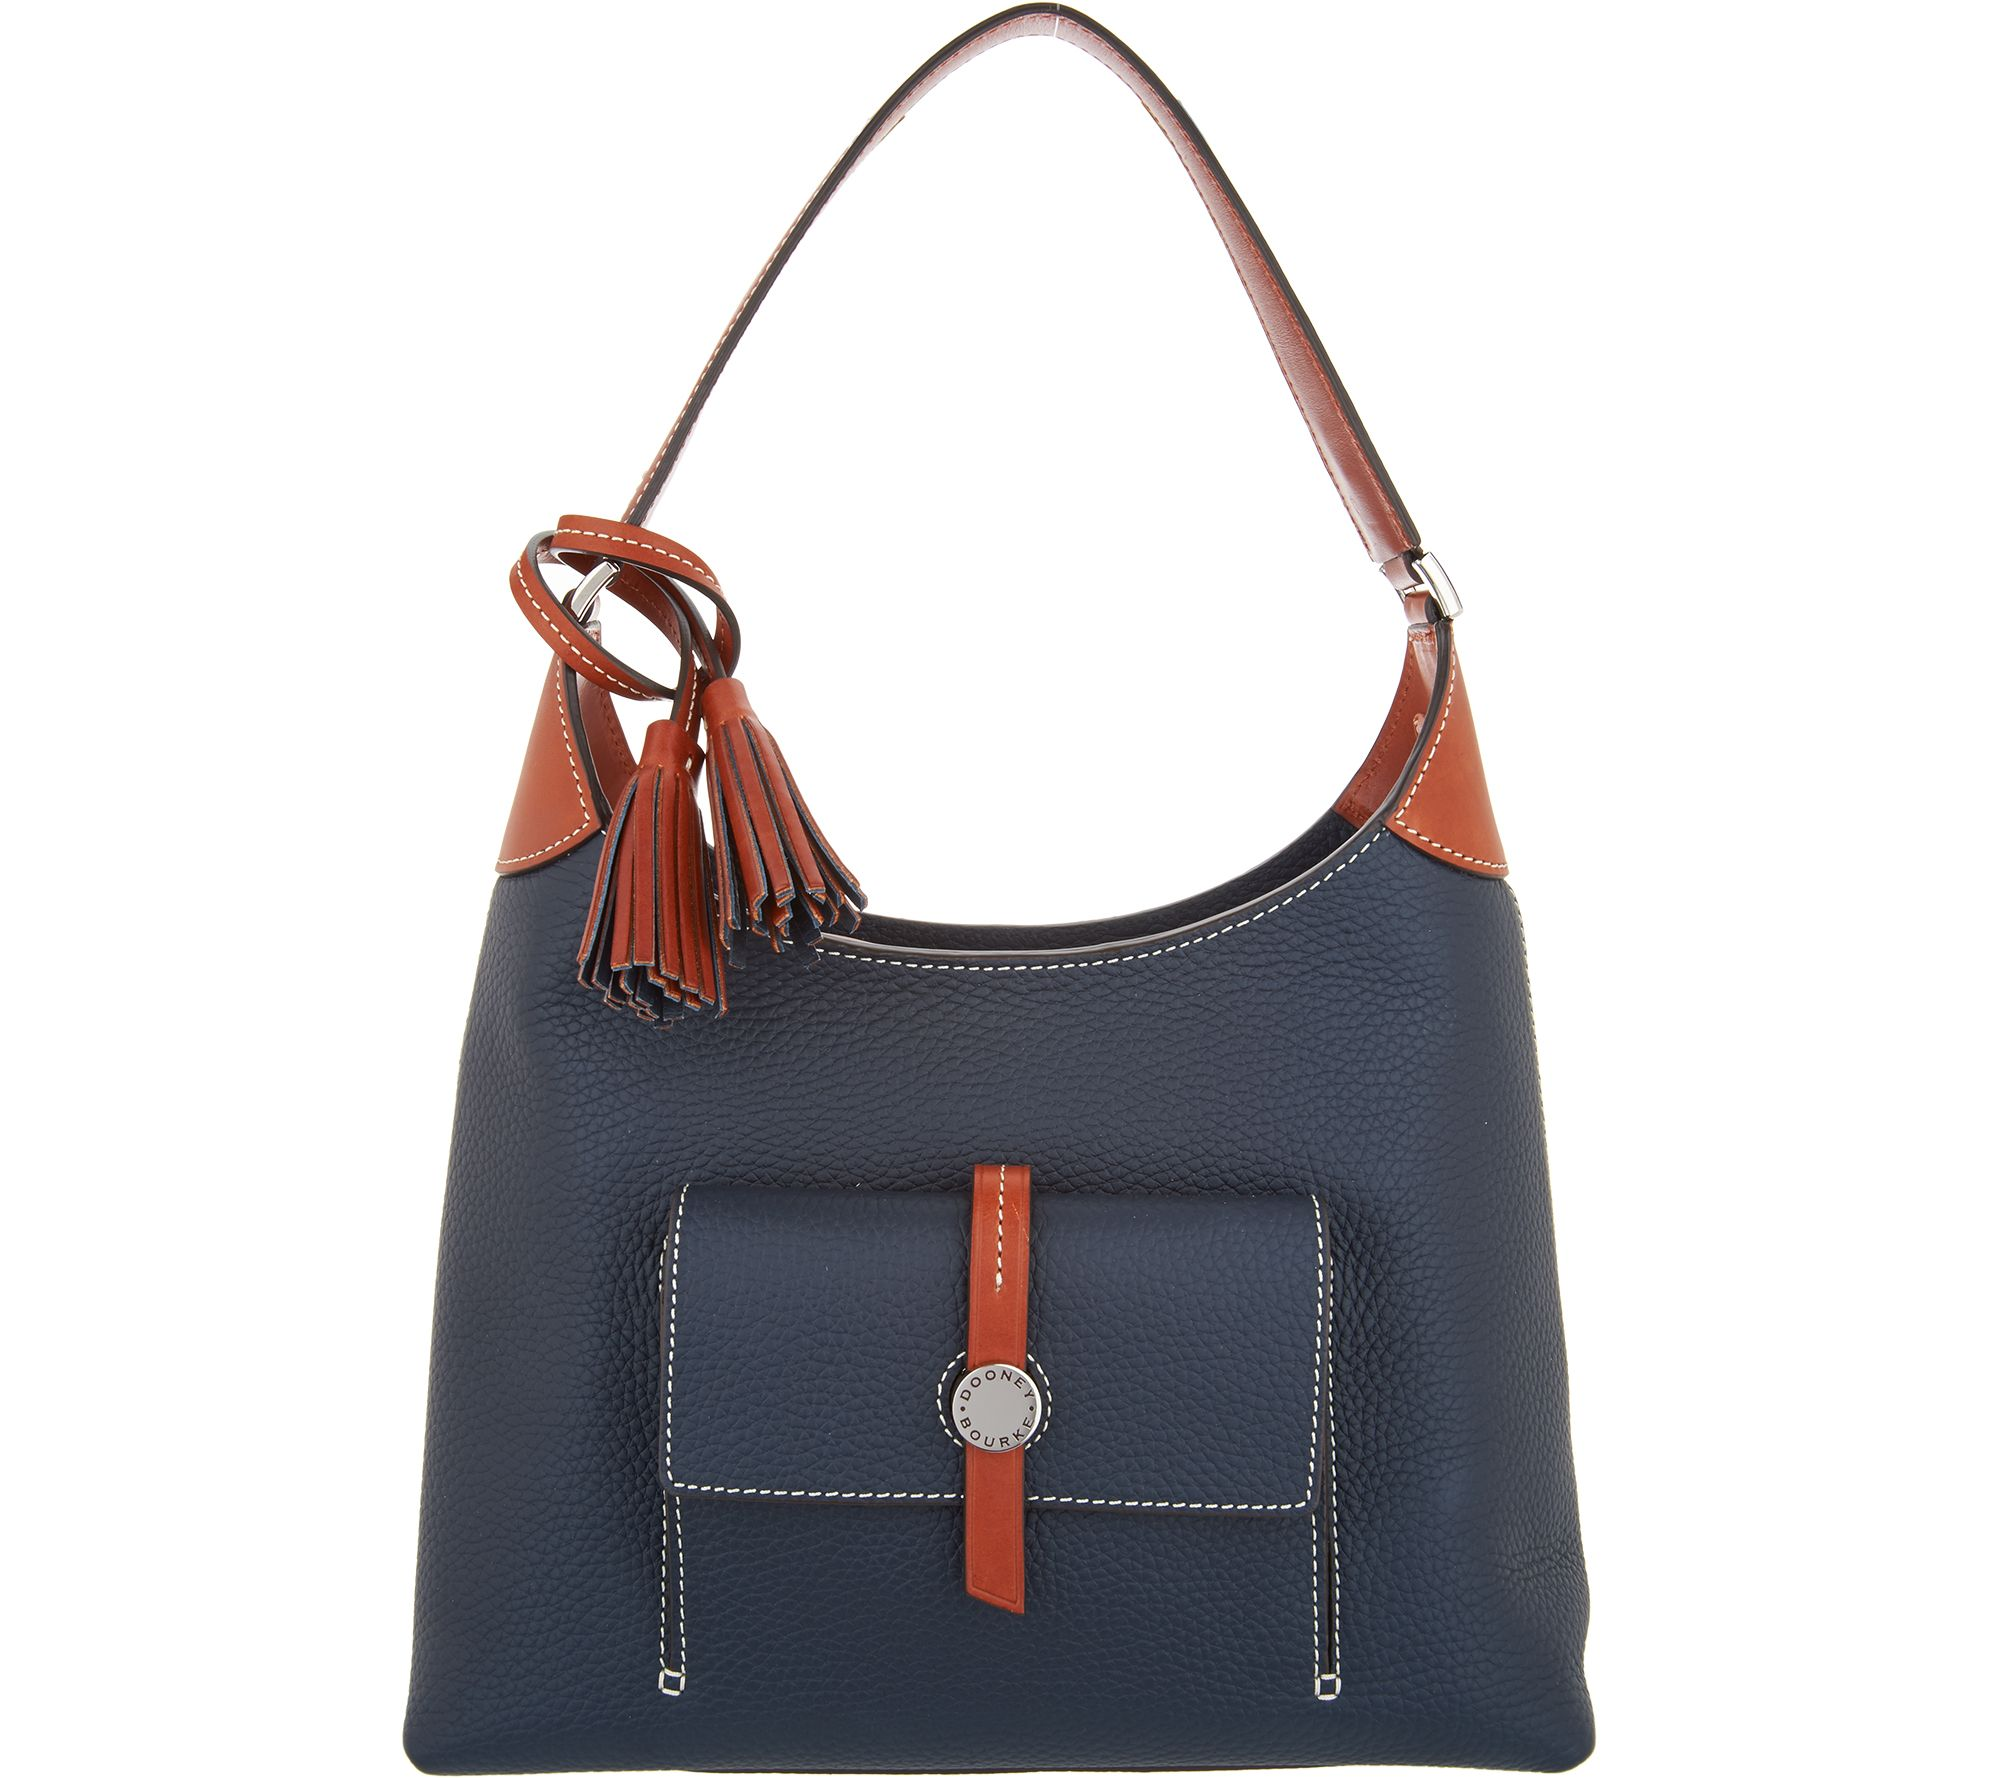 Dooney & Bourke — Leather Handbags & Mini Bags — QVC.com